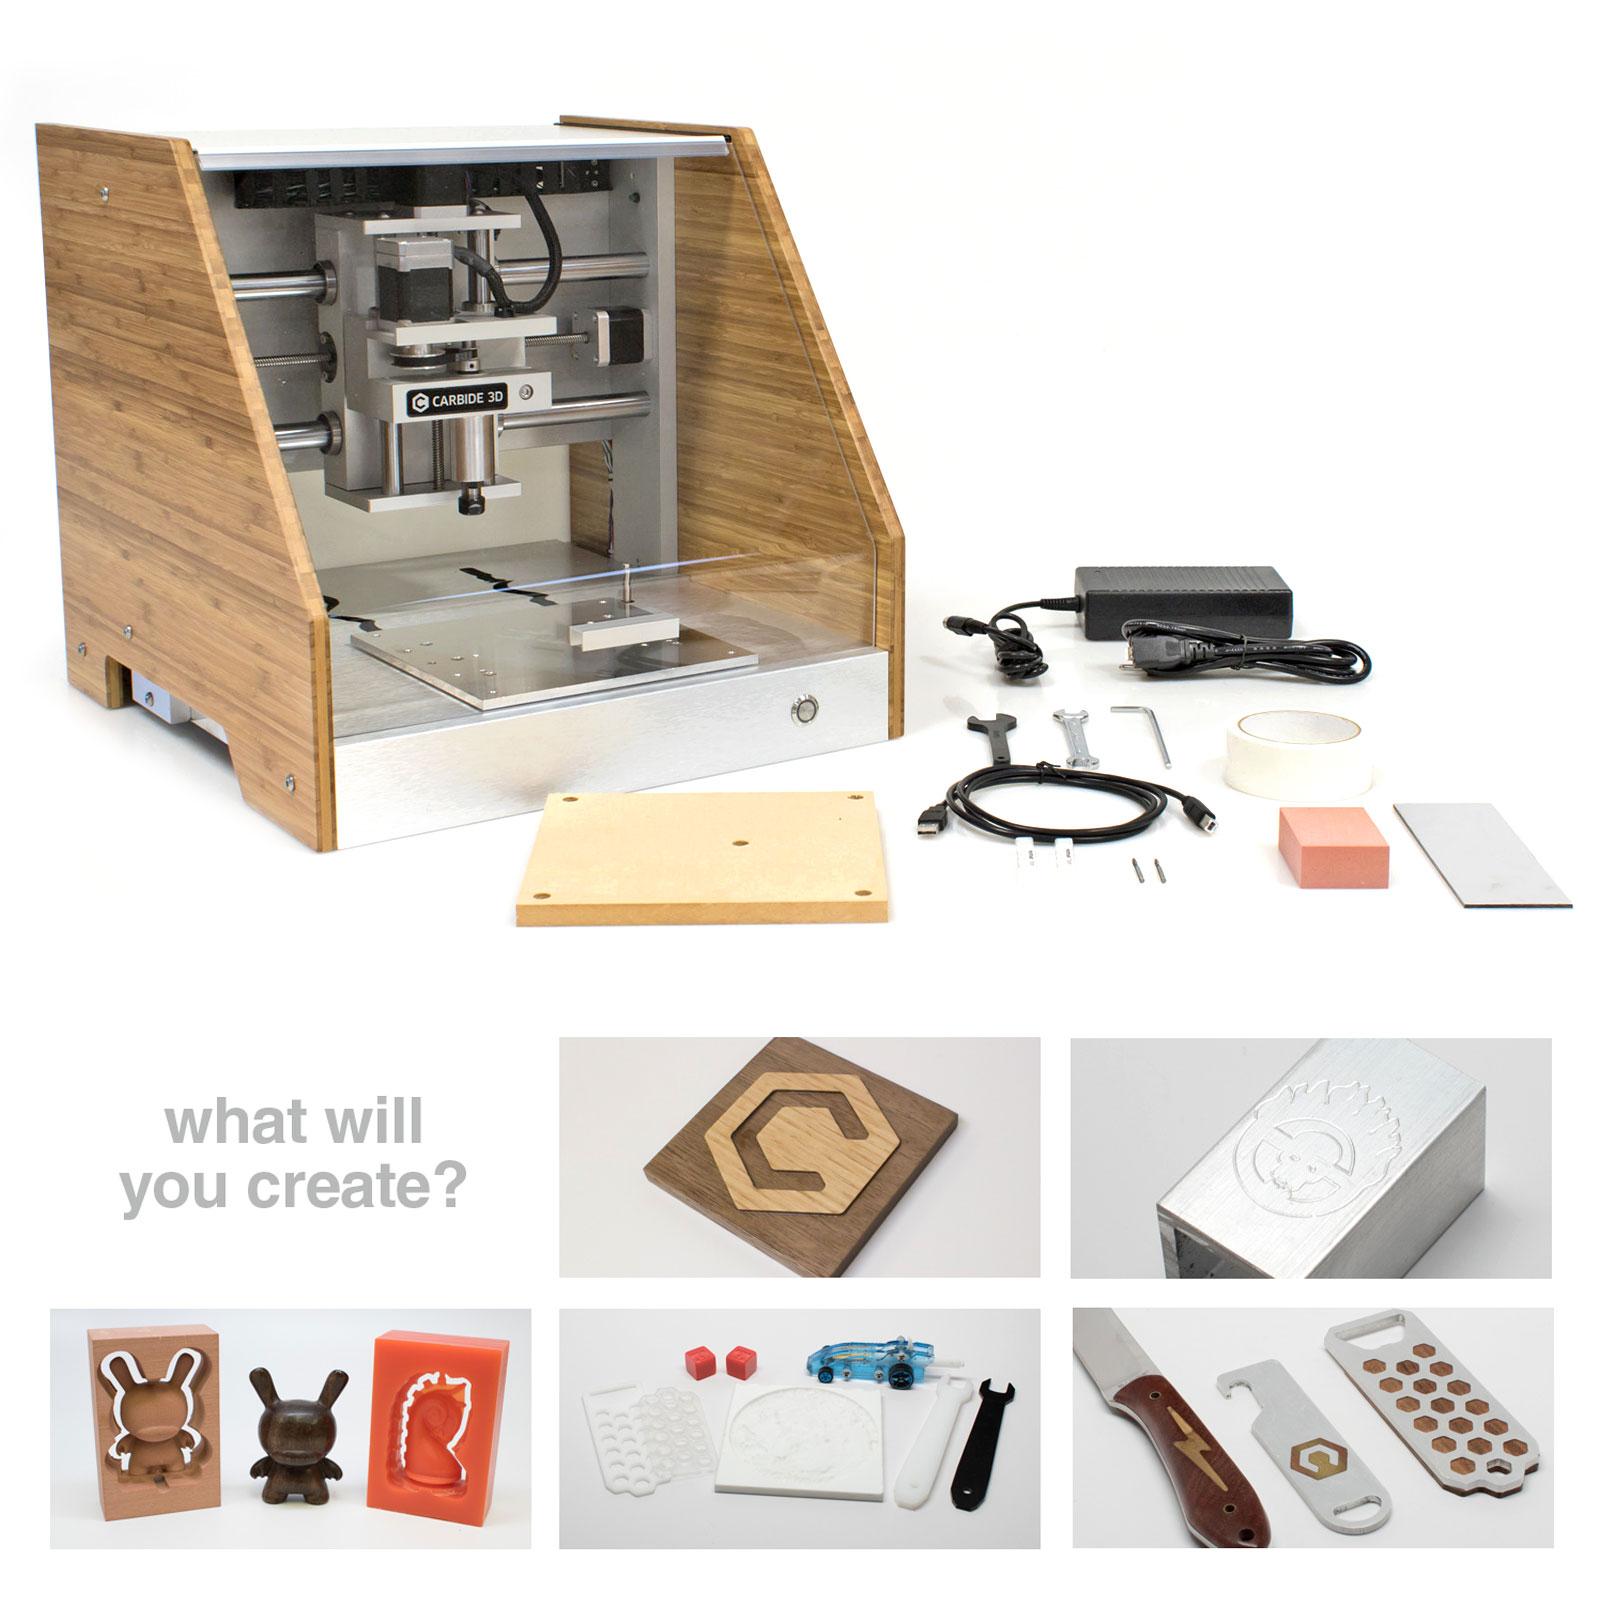 Nomad 883 Pro Home/Hobbyist CNC Machine